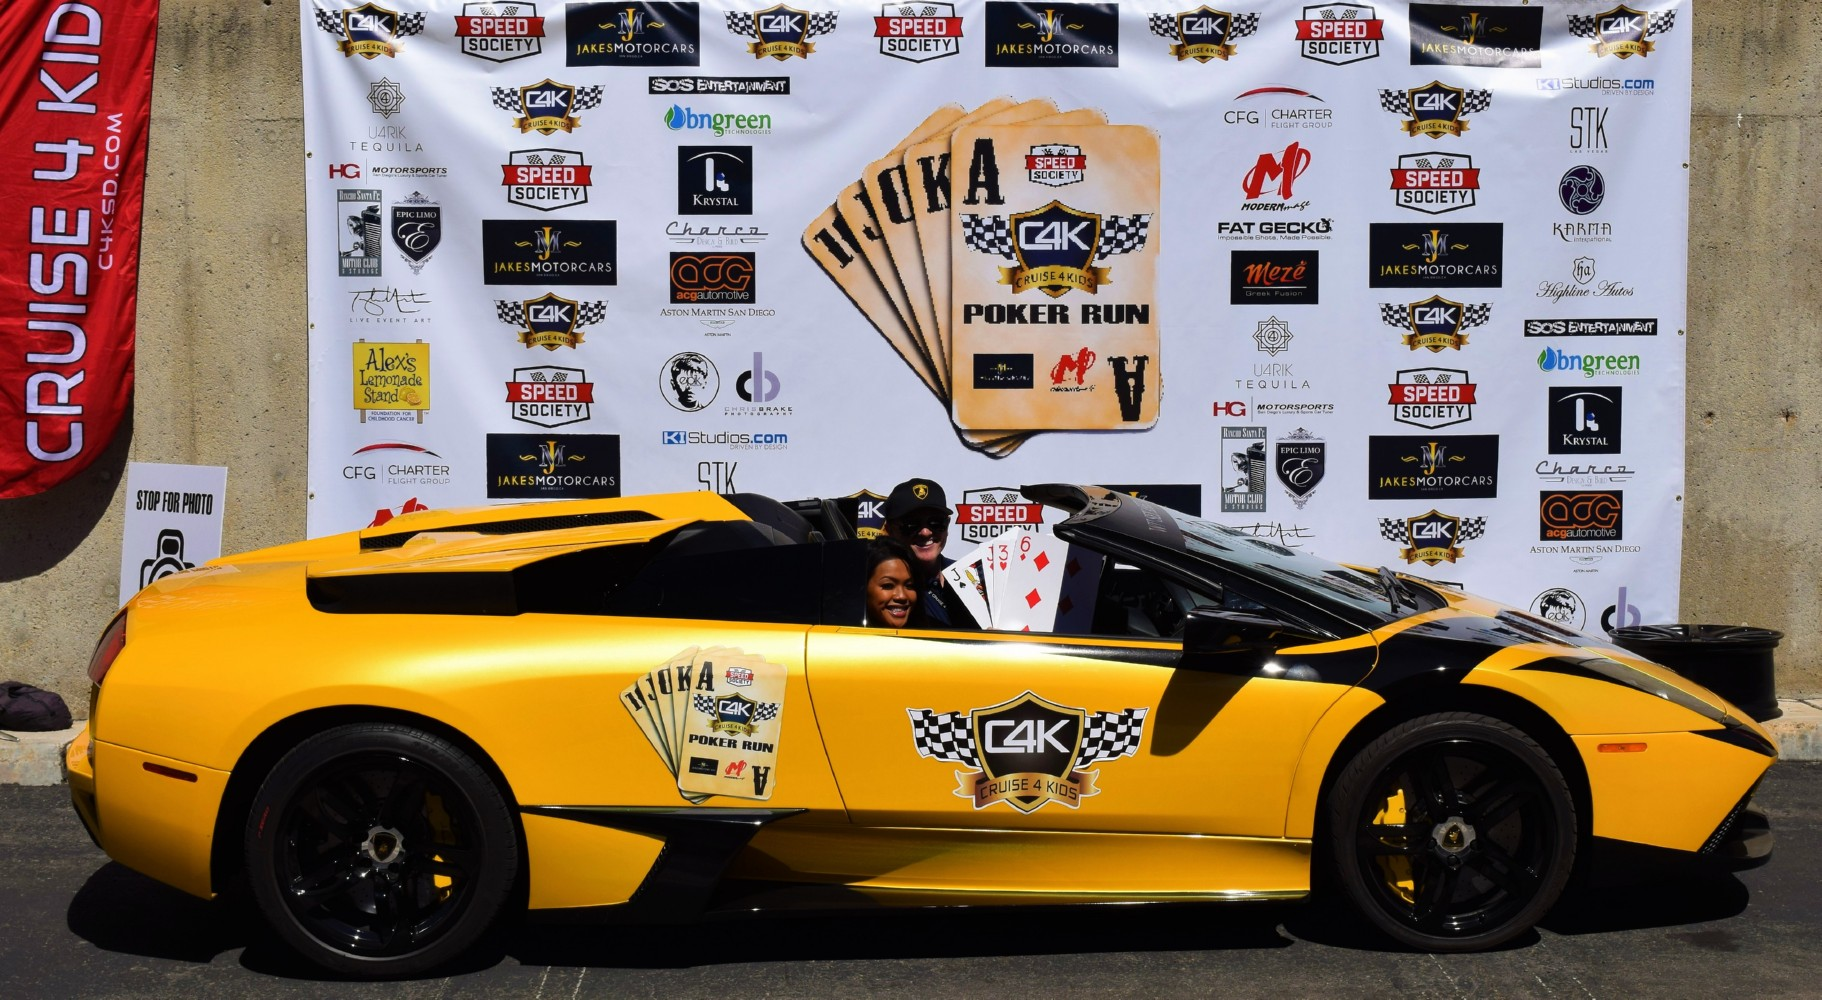 Poker Run 2017 Banner Photos - 18.jpg